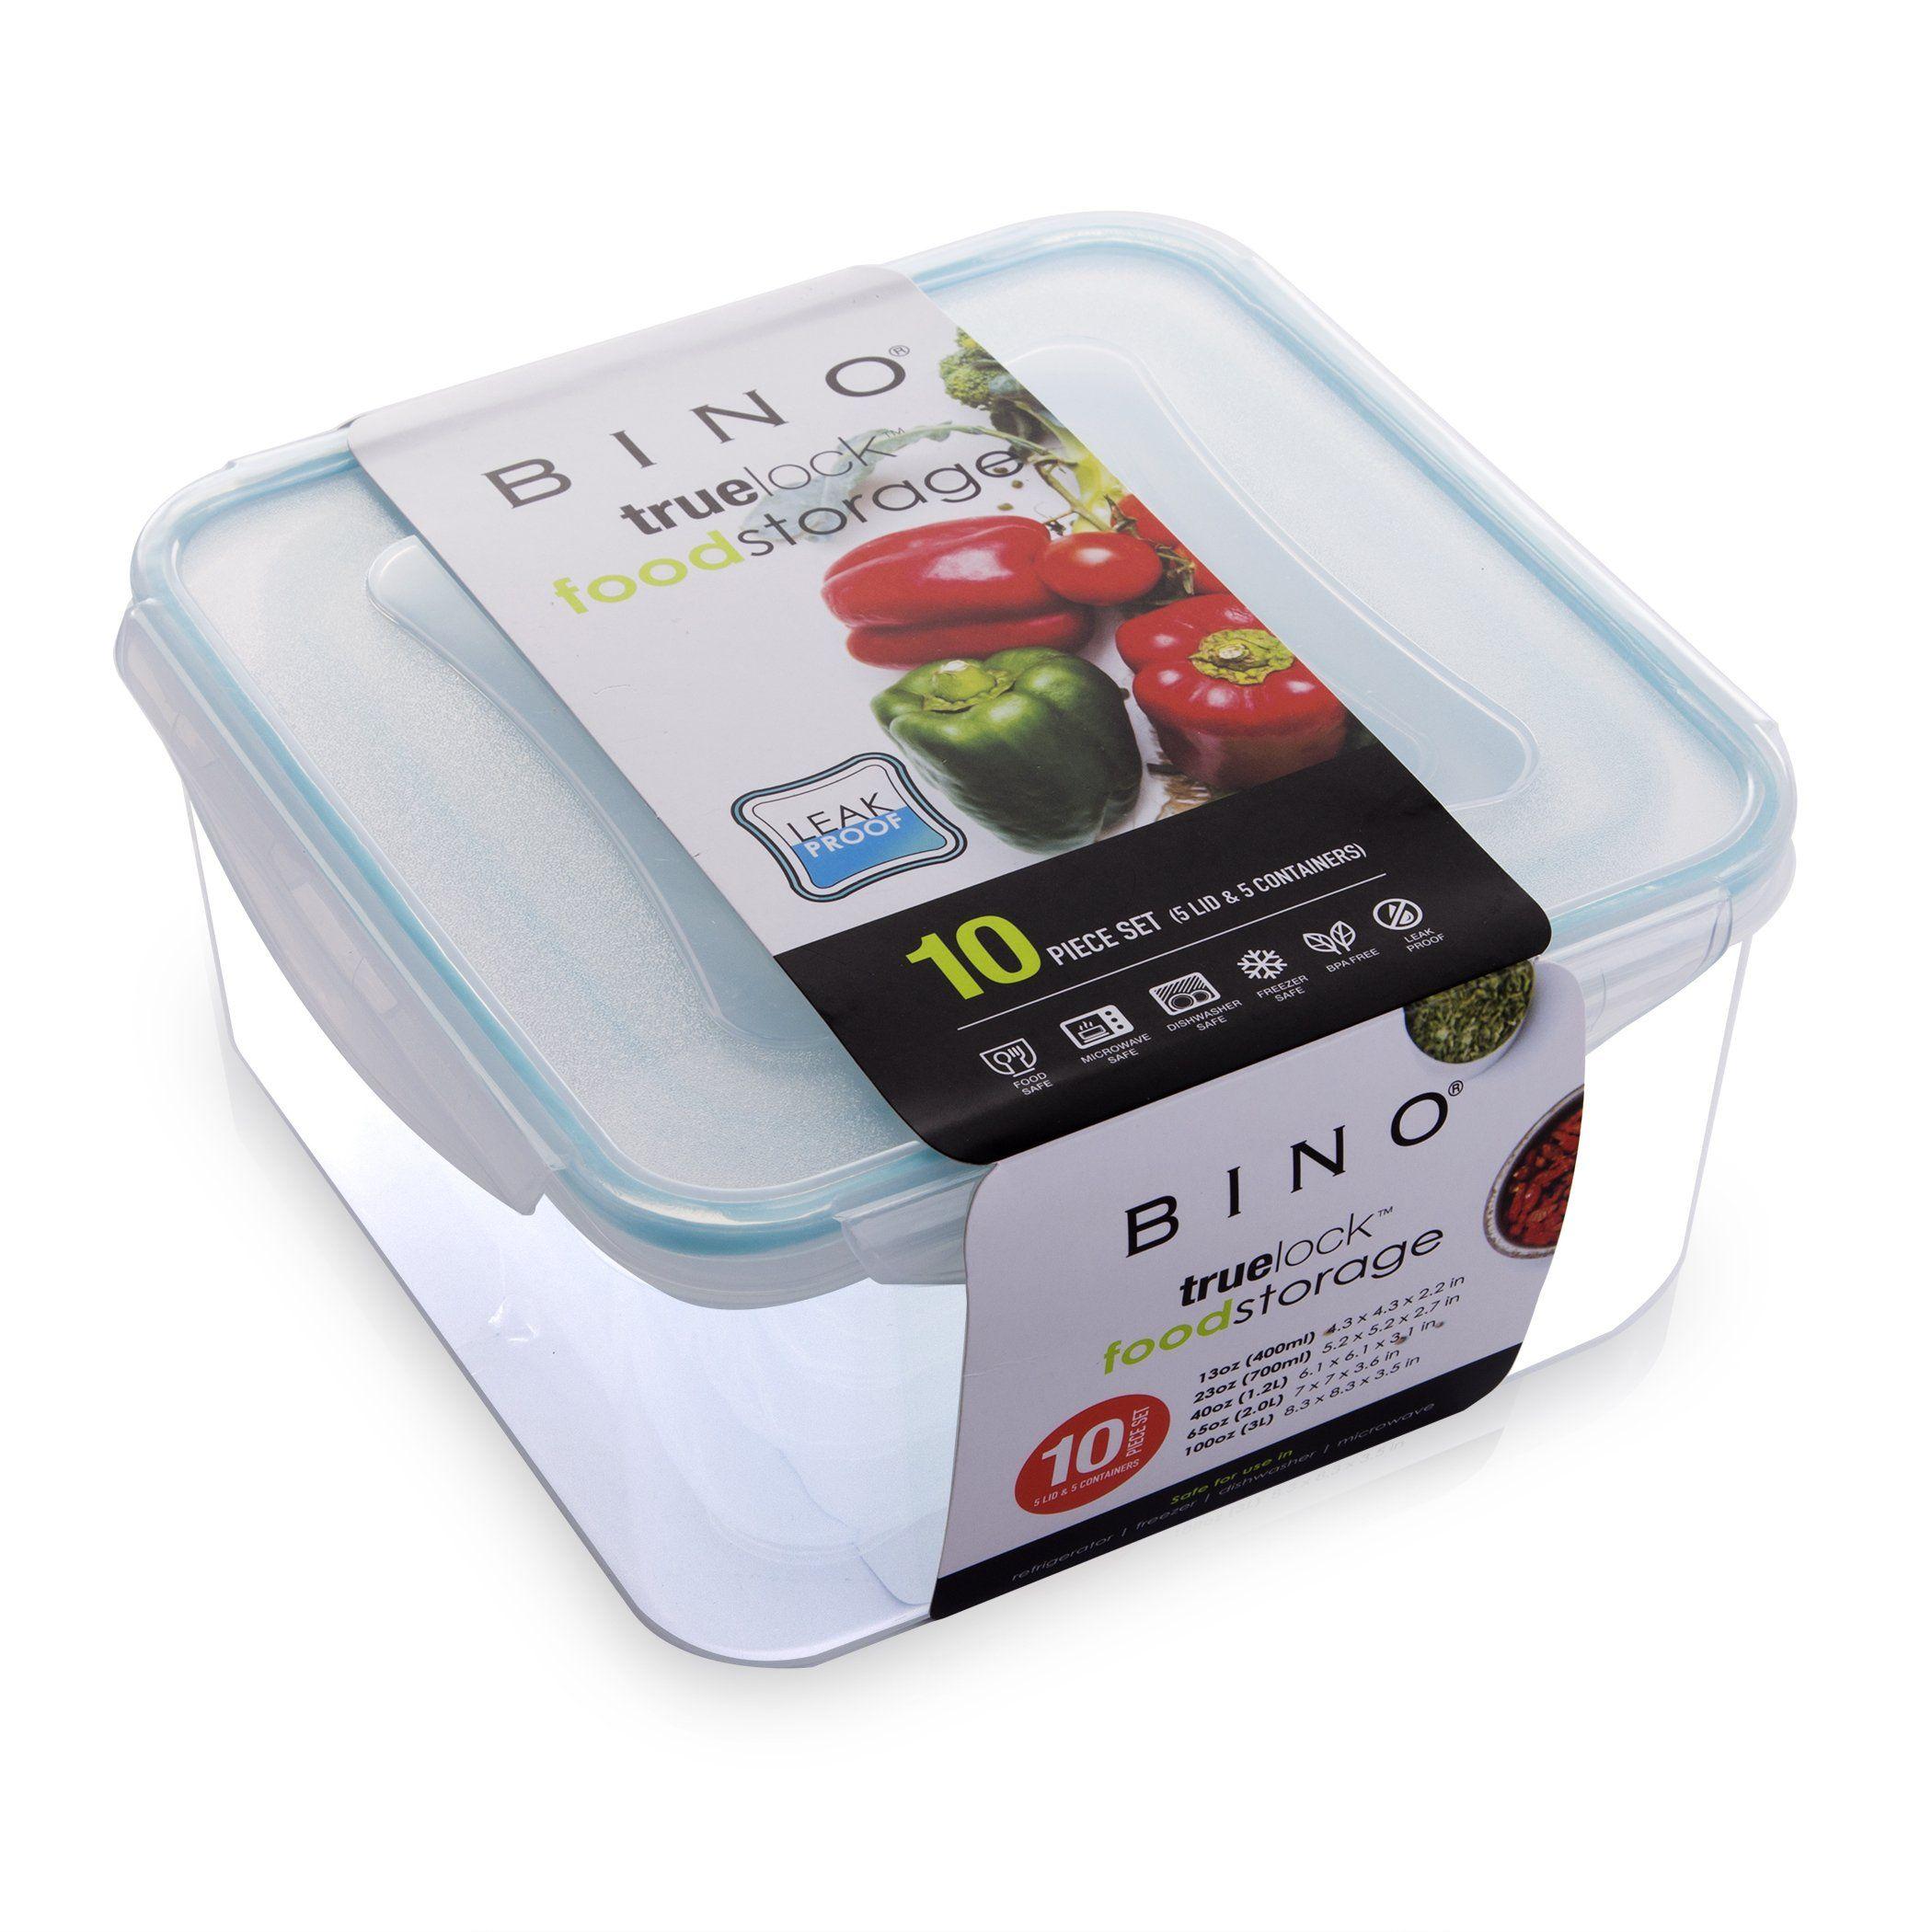 16ed4efa4e82 BINO TRUELOCK 10Piece Square LeakProof Plastic Snap Lock Food ...